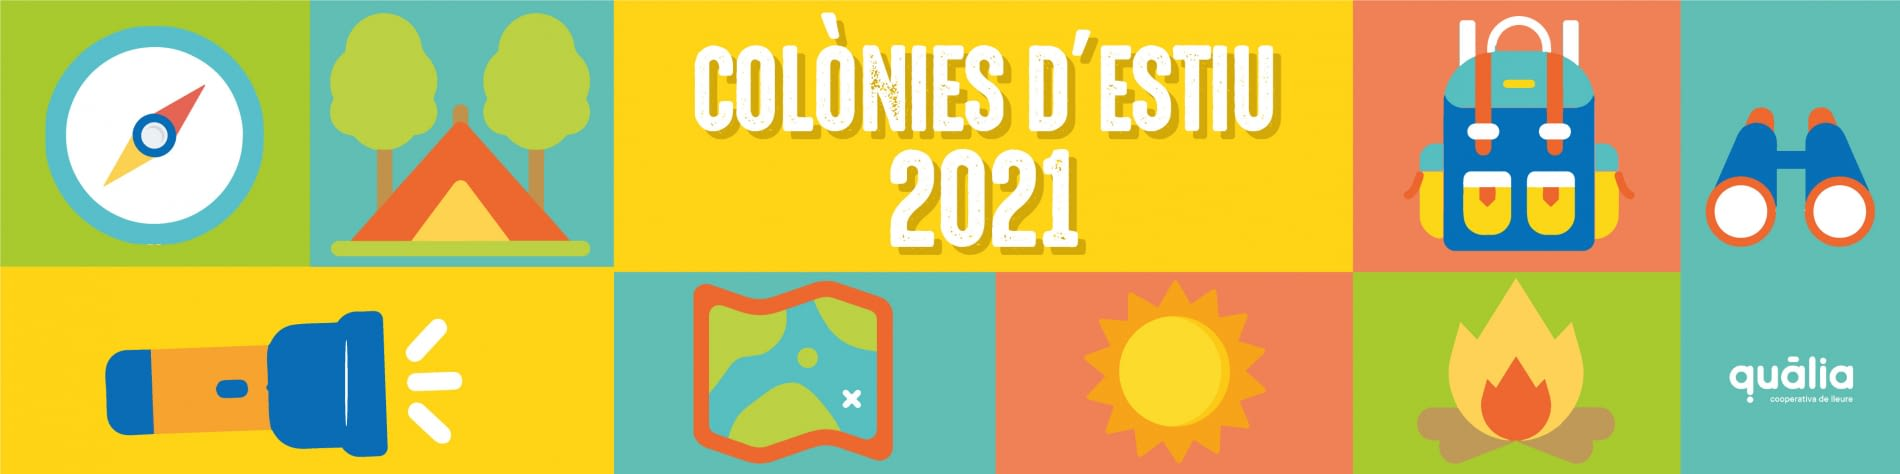 banner colonies estiu